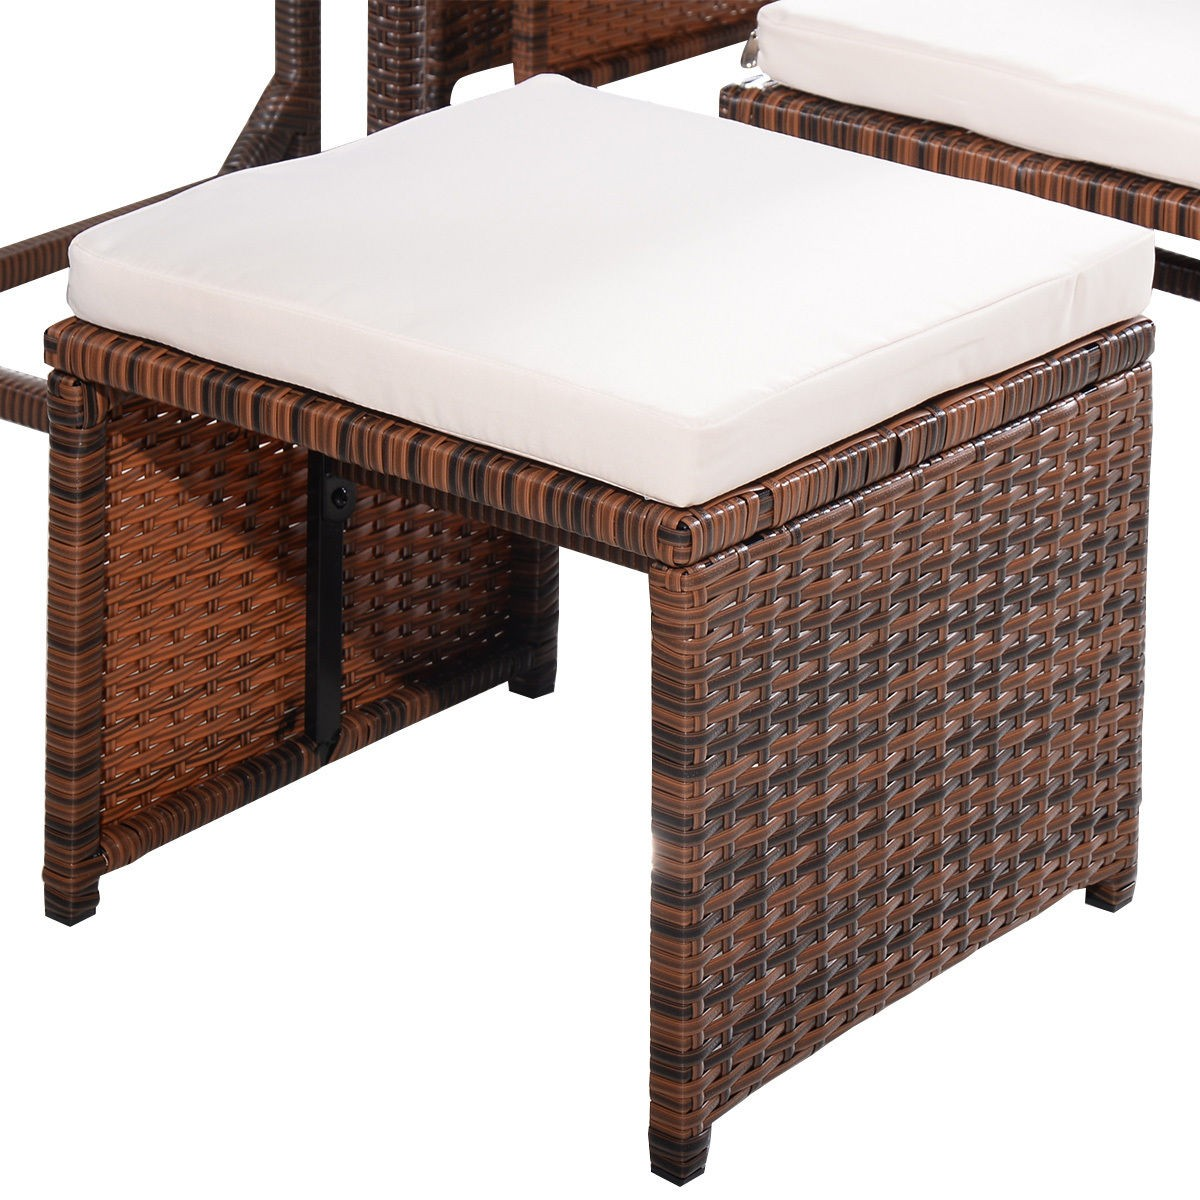 brown 9 pc mix patio garden rattan wicker sofa set furniture cushioned w ottoman. Black Bedroom Furniture Sets. Home Design Ideas